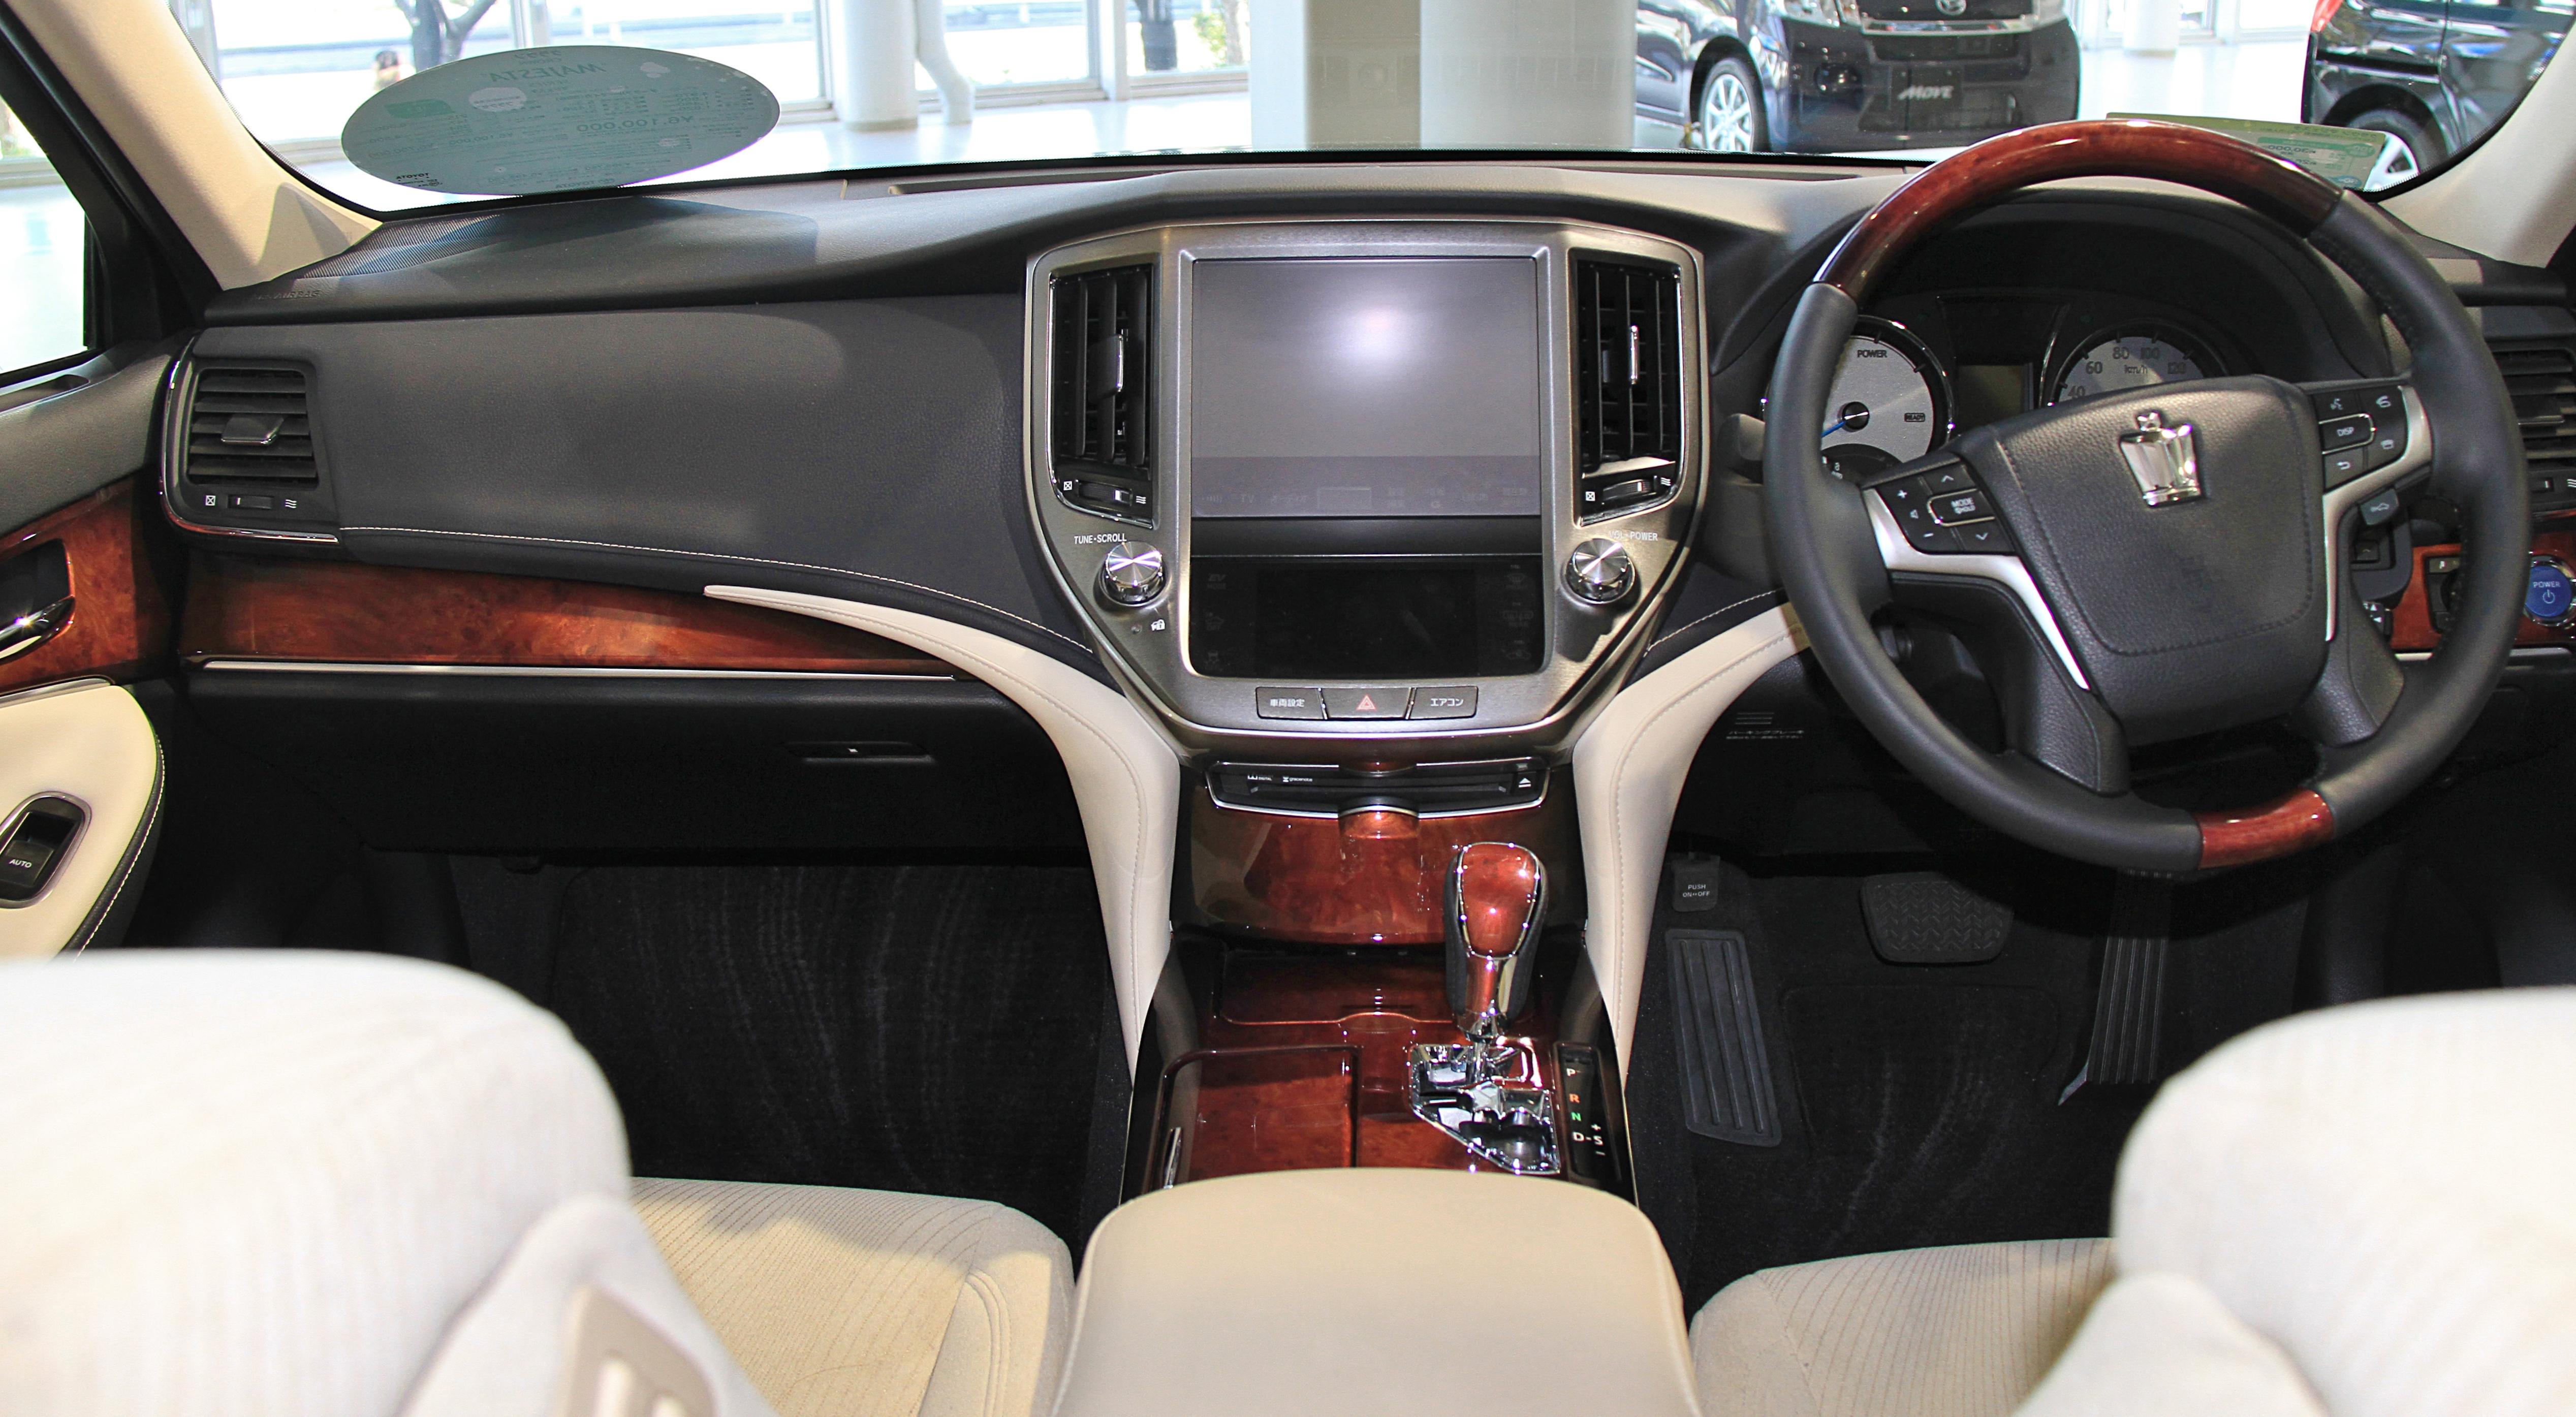 Toyota Crown 2018 Interior >> File:Toyota Crown Majesta S210 interior.jpg - Wikimedia Commons